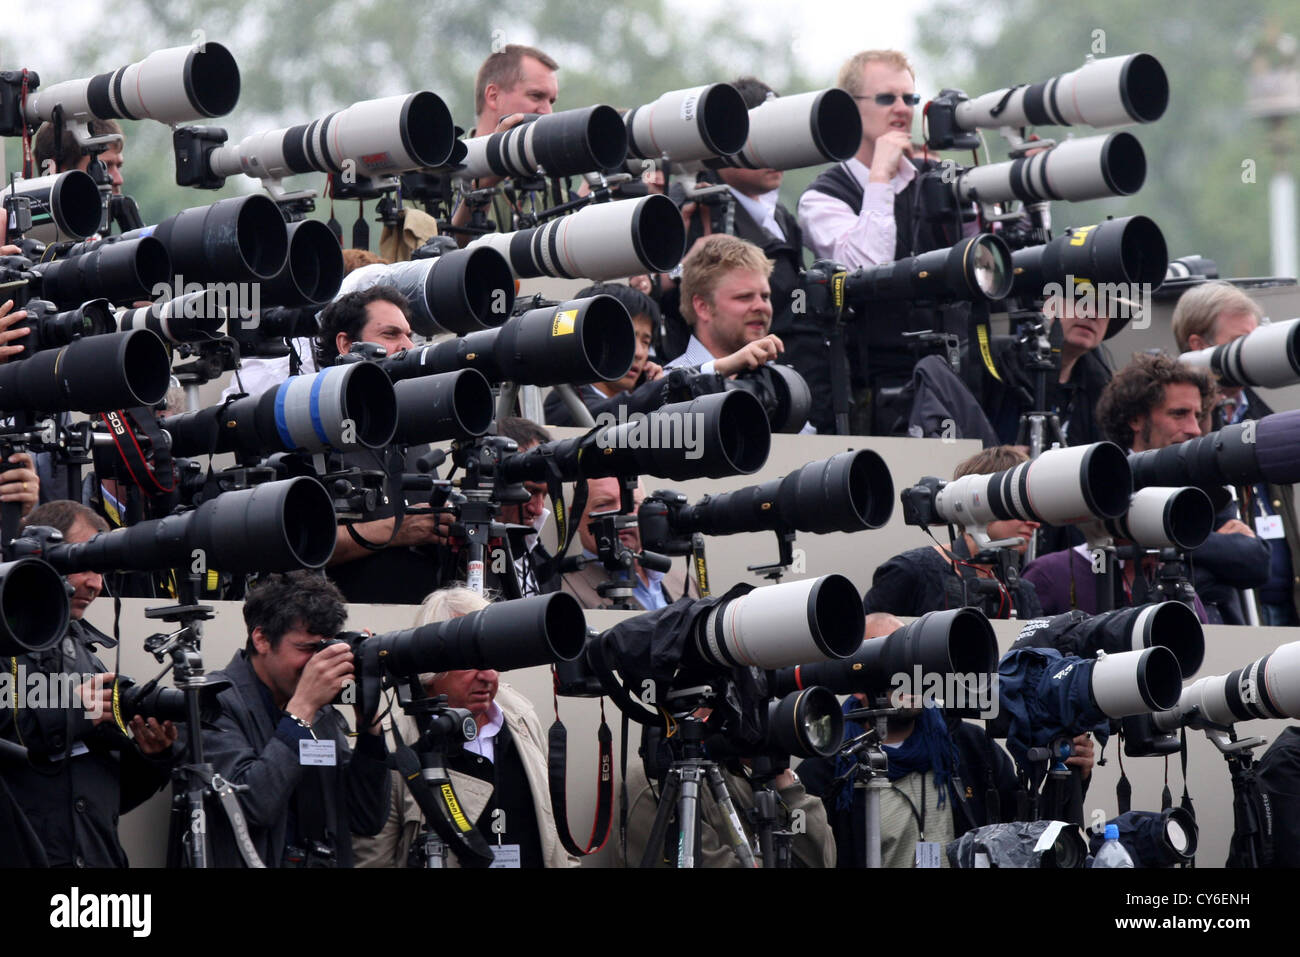 PRESS PHOTOGRAPHERS OUTSIDE BUCKINGHAM PALACE ON THE ROYAL WEDDING DAY OF PRINCE WILLIAM AND KATE MIDDLETON - Stock Image